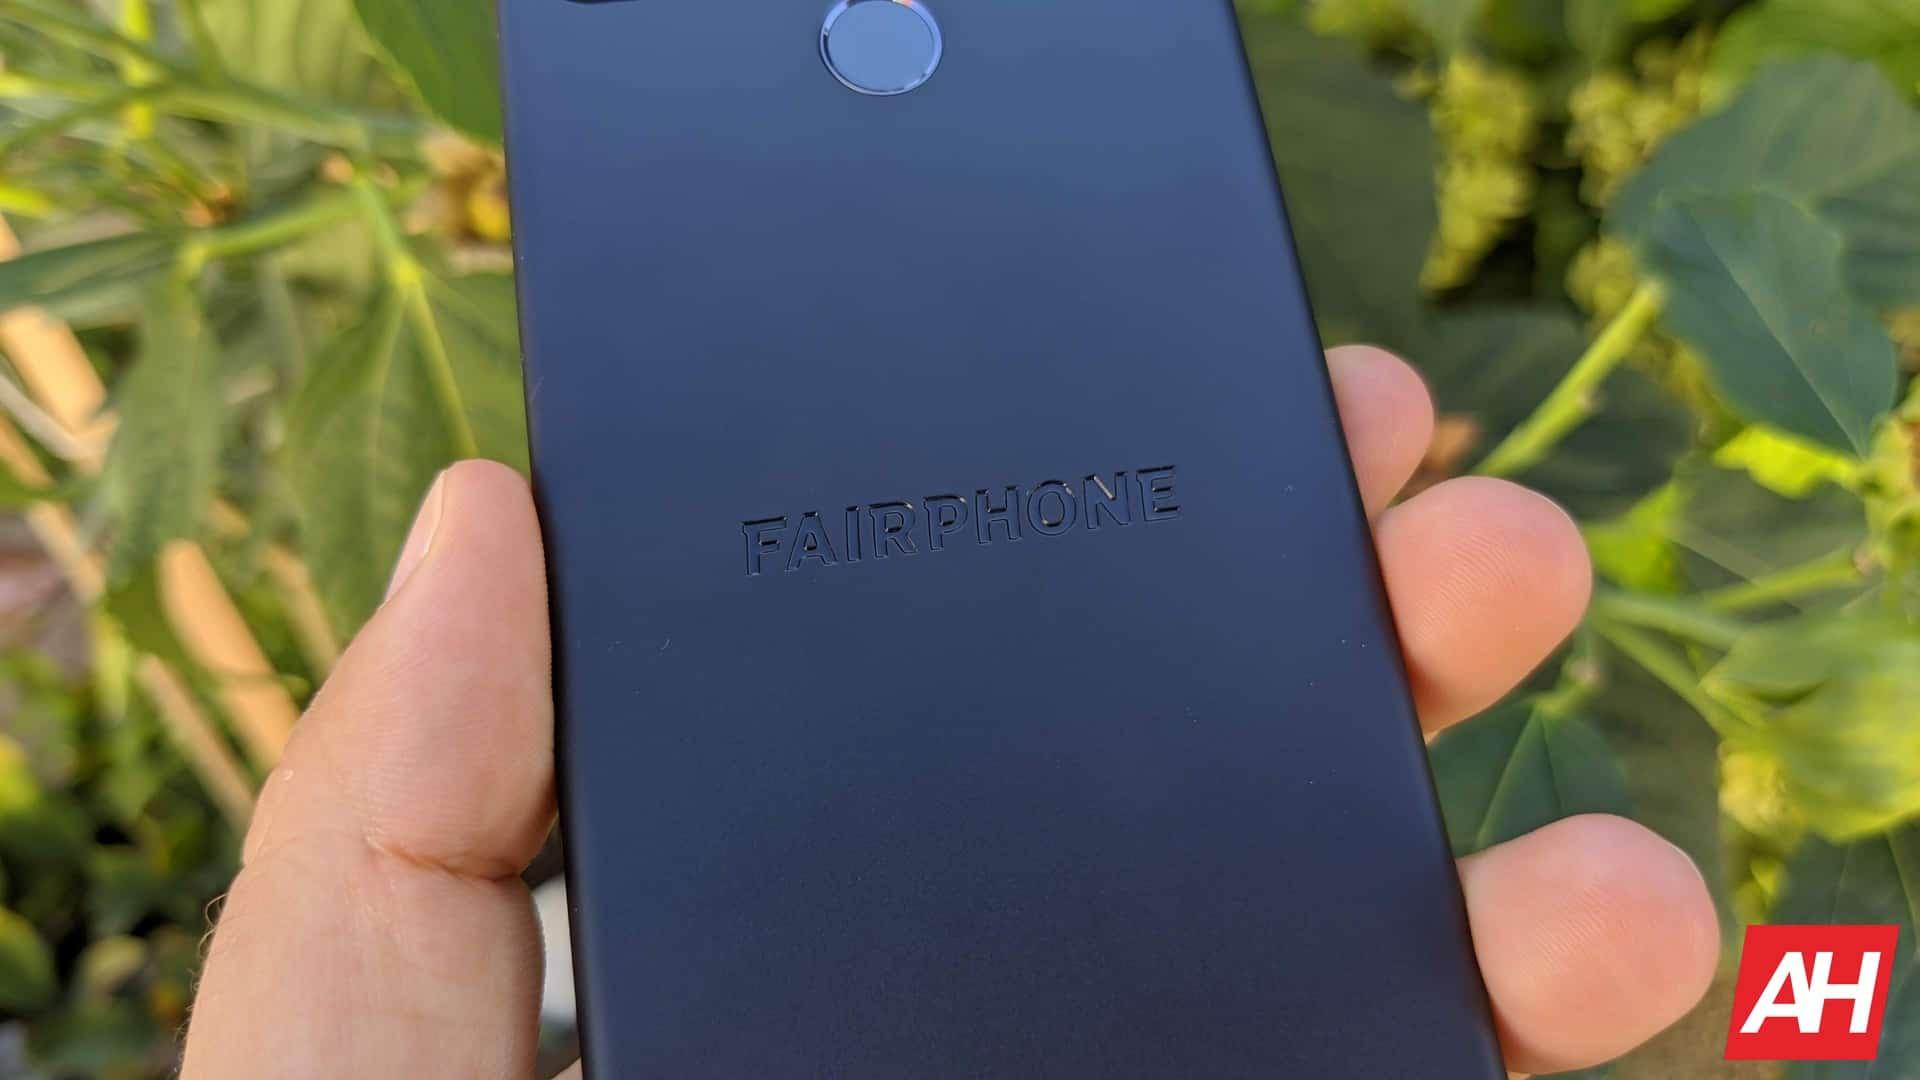 AH Fairphone 3 Plus image 4